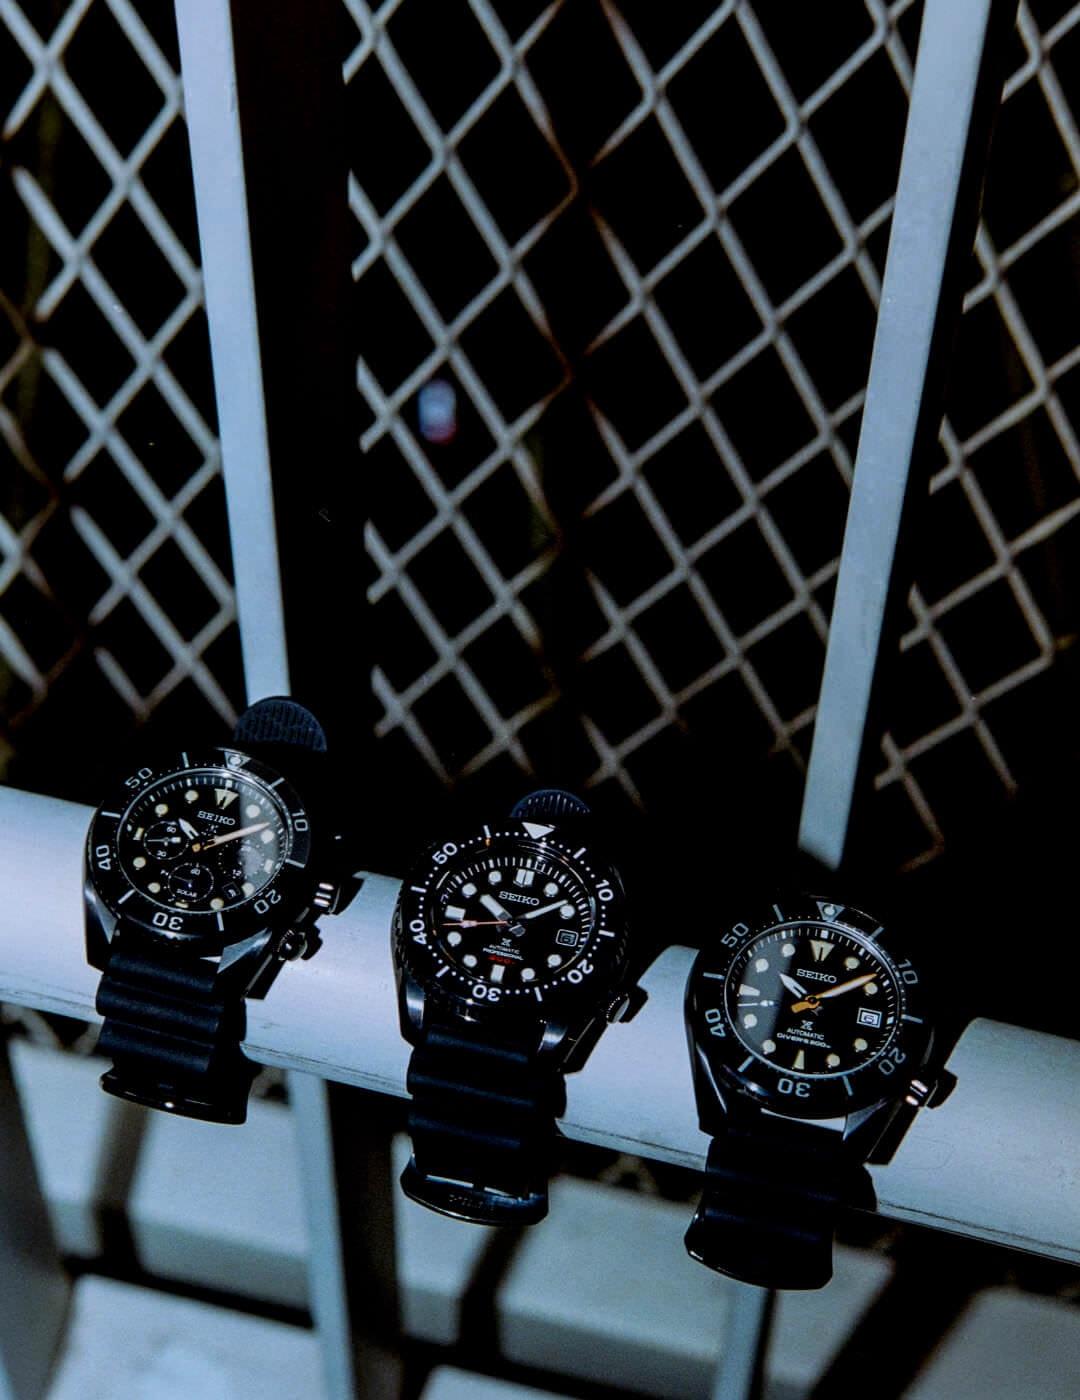 Seiko Prospex セイコー プロスペックス エディトリアル 時計 カジュアルウオッチブランド